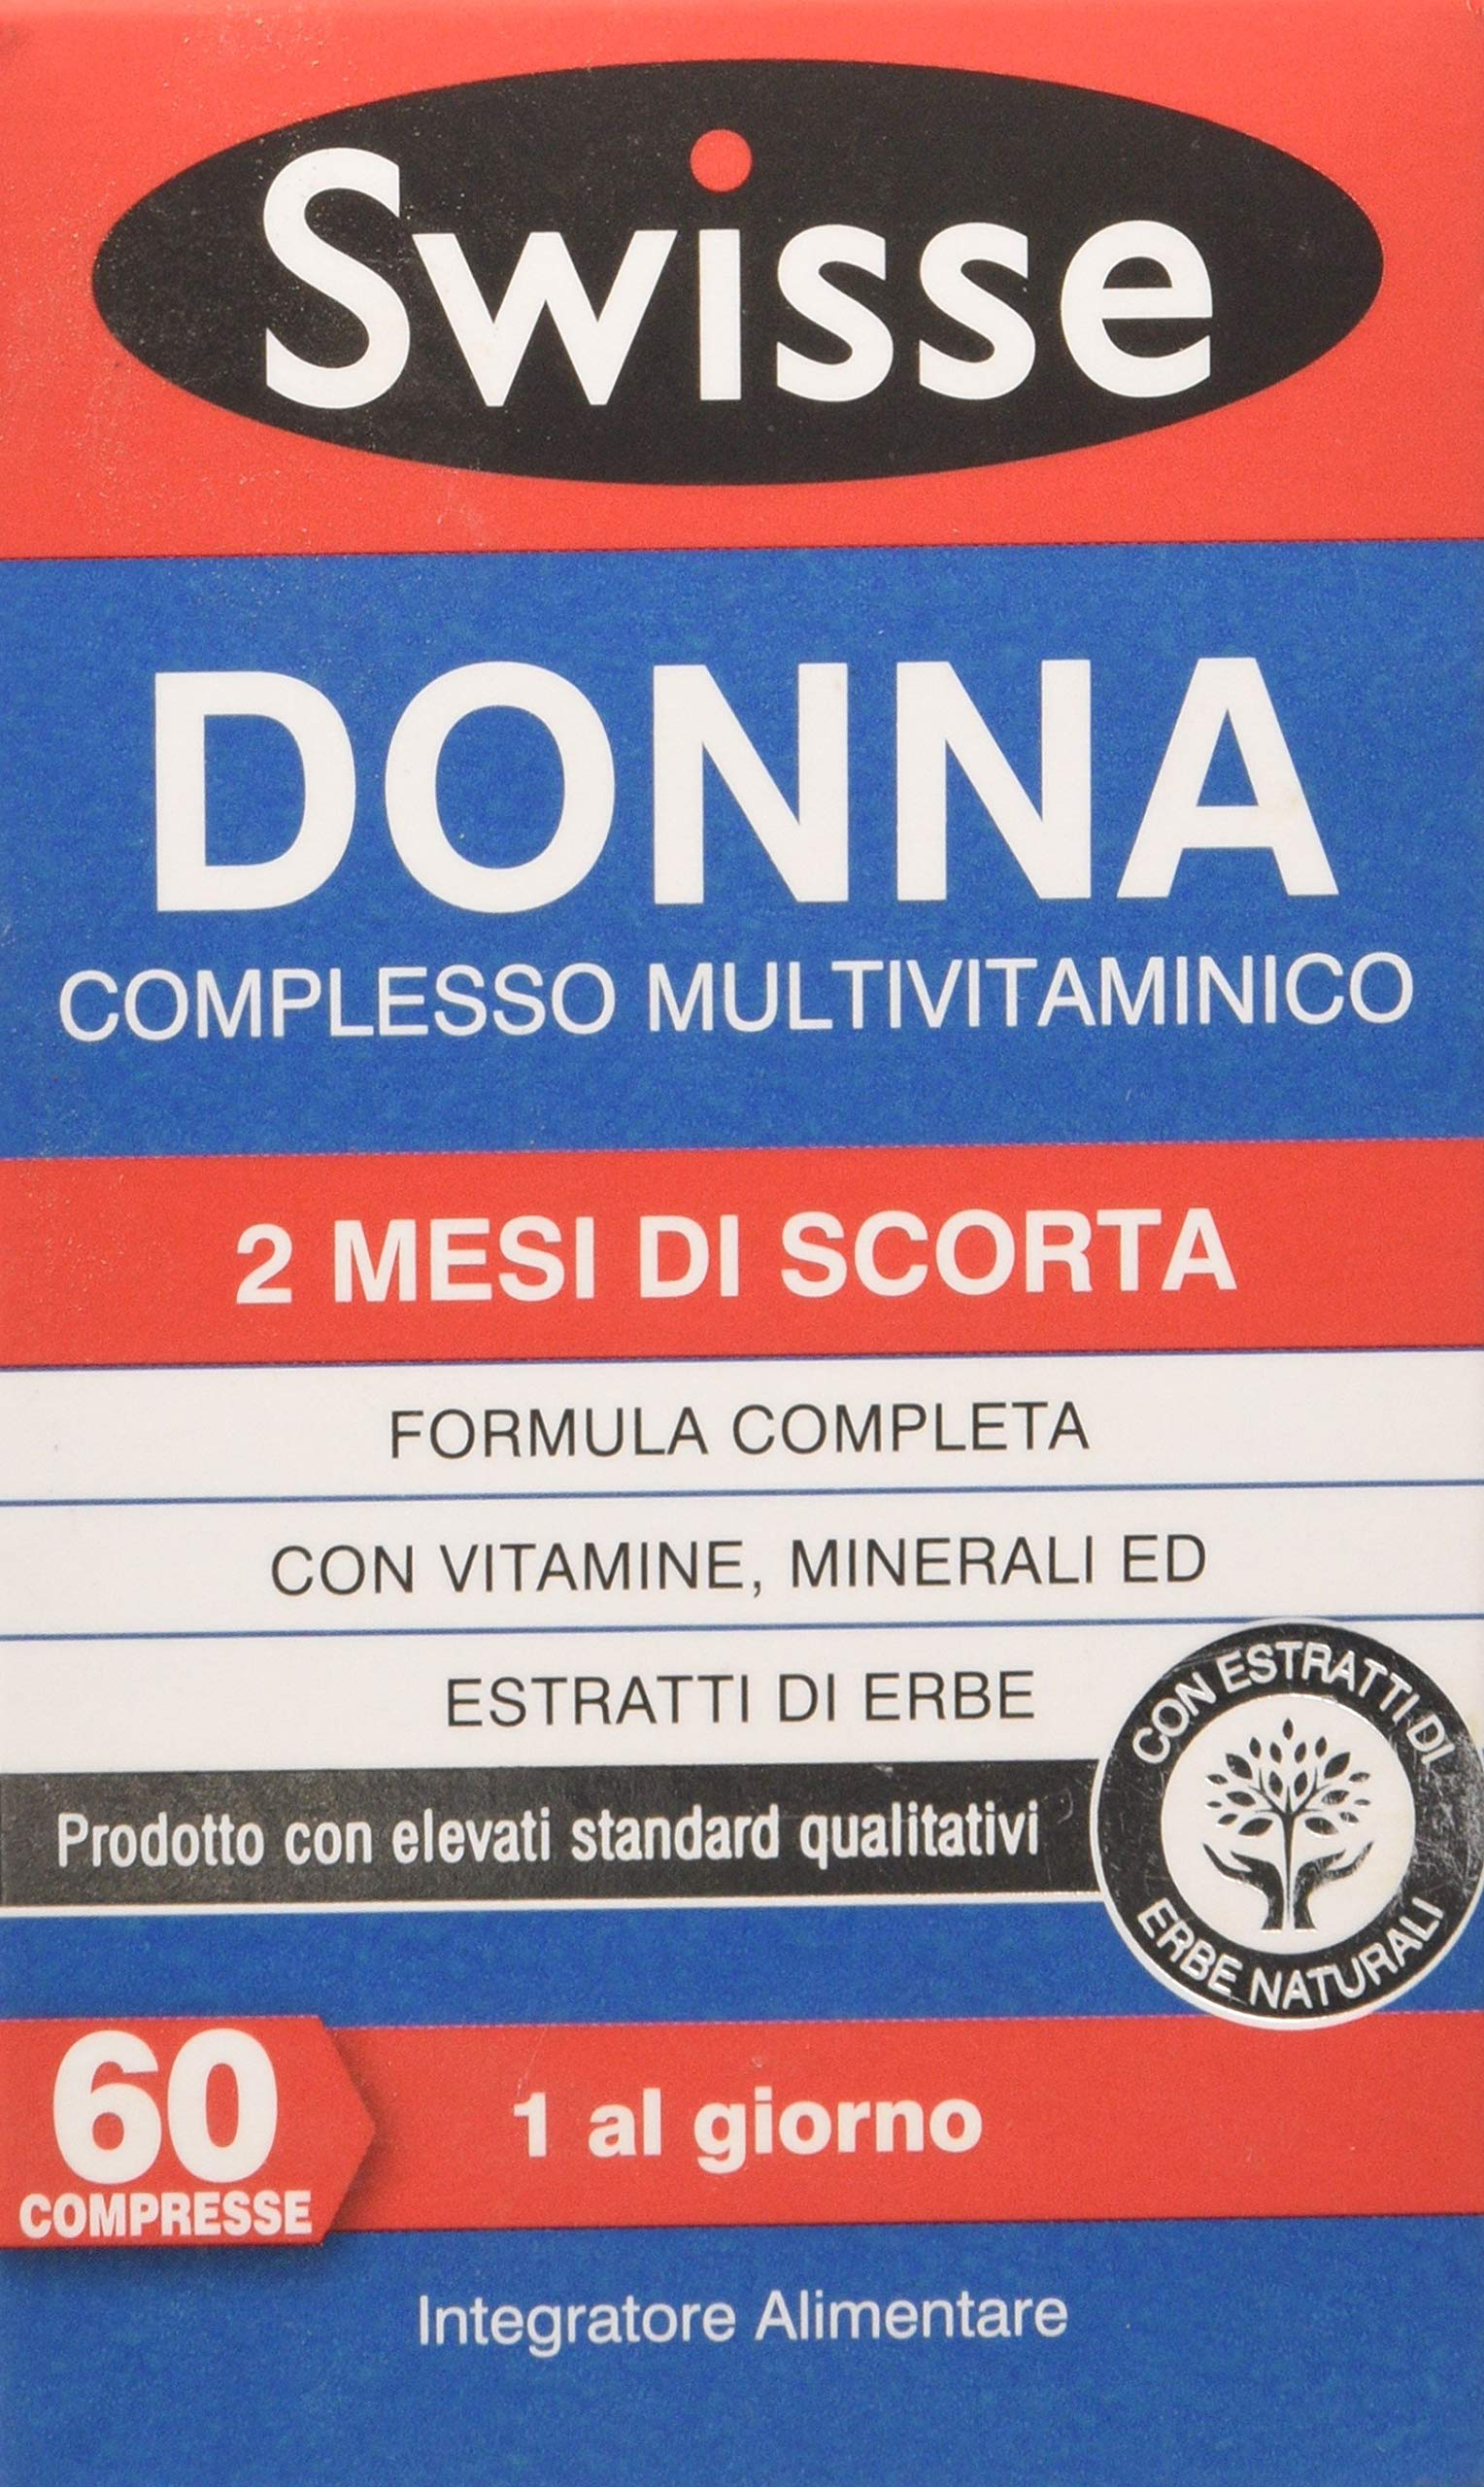 Swisse Donna Complesso Multivitaminico - 60 compresse 1 spesavip